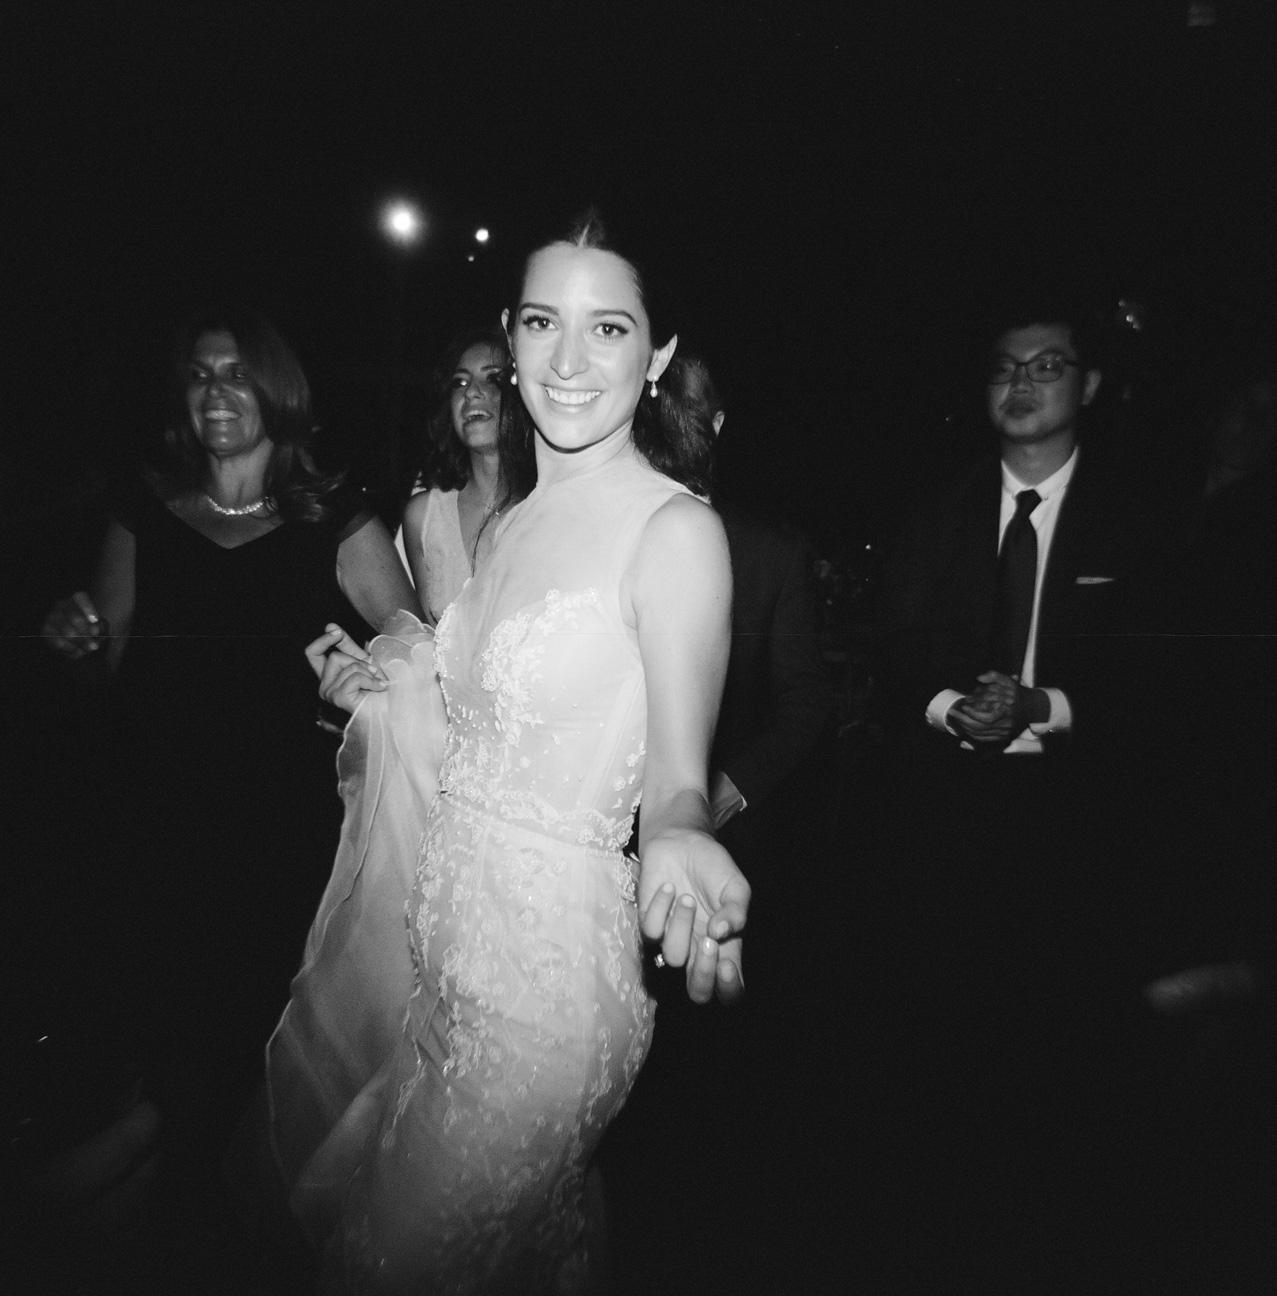 KarenHillPhotography-Parizat-Wedding-1075.jpg